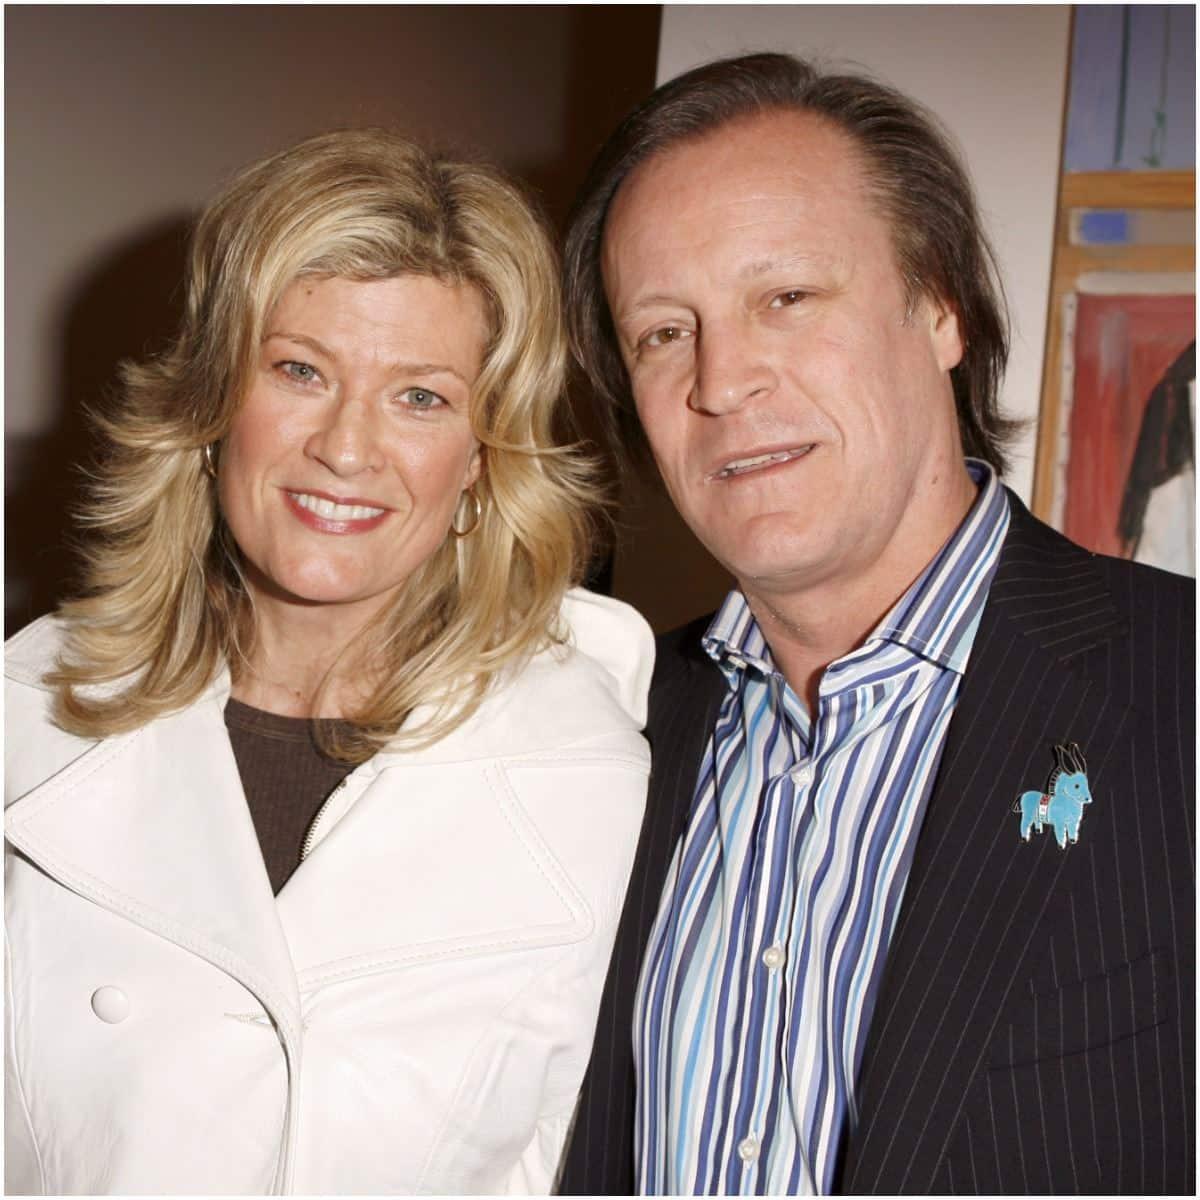 Dana Wheeler-Nicholson and husband Alex Smith